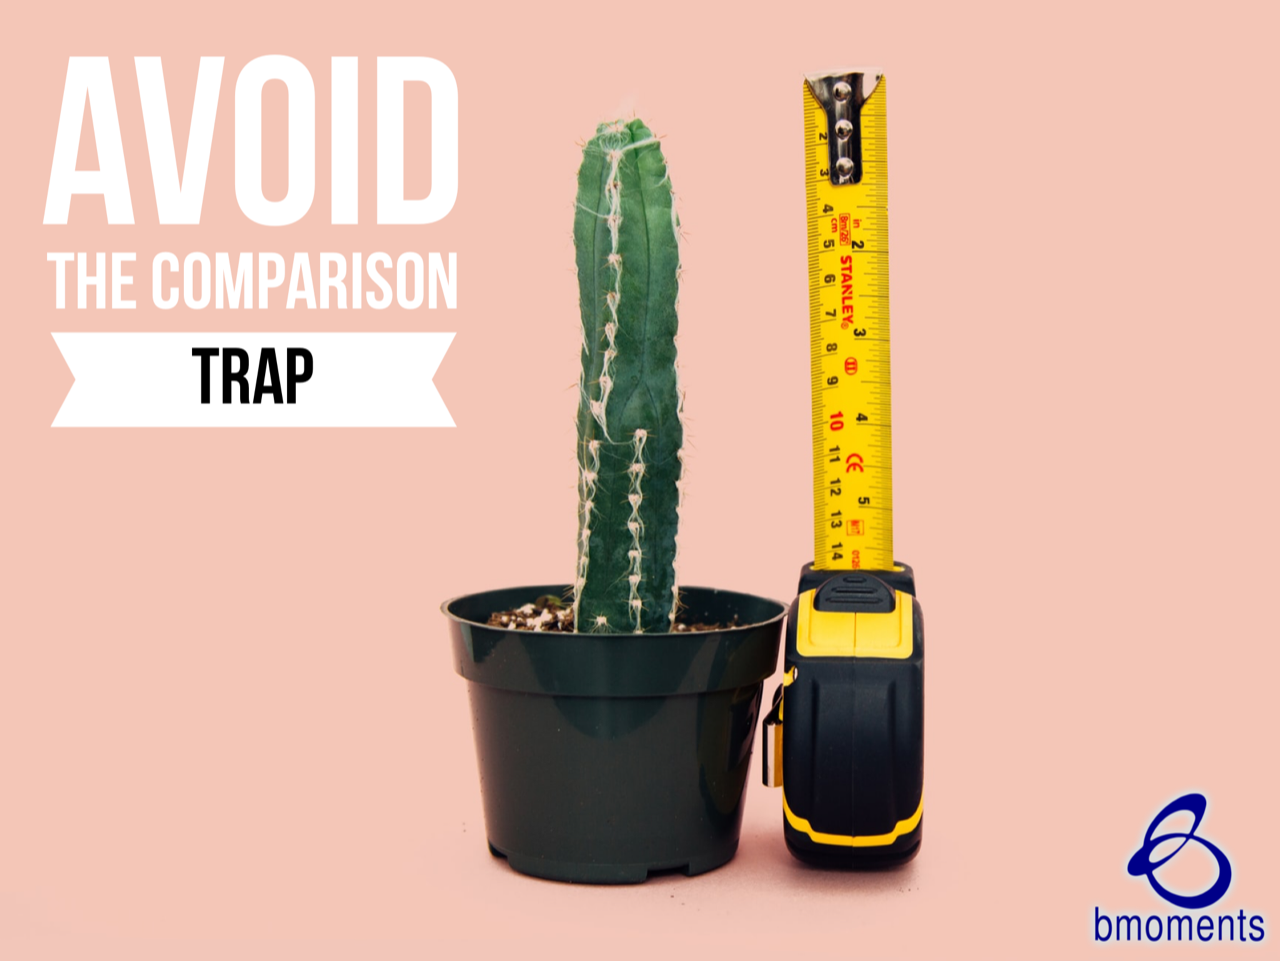 Avoid the Comparison Trap